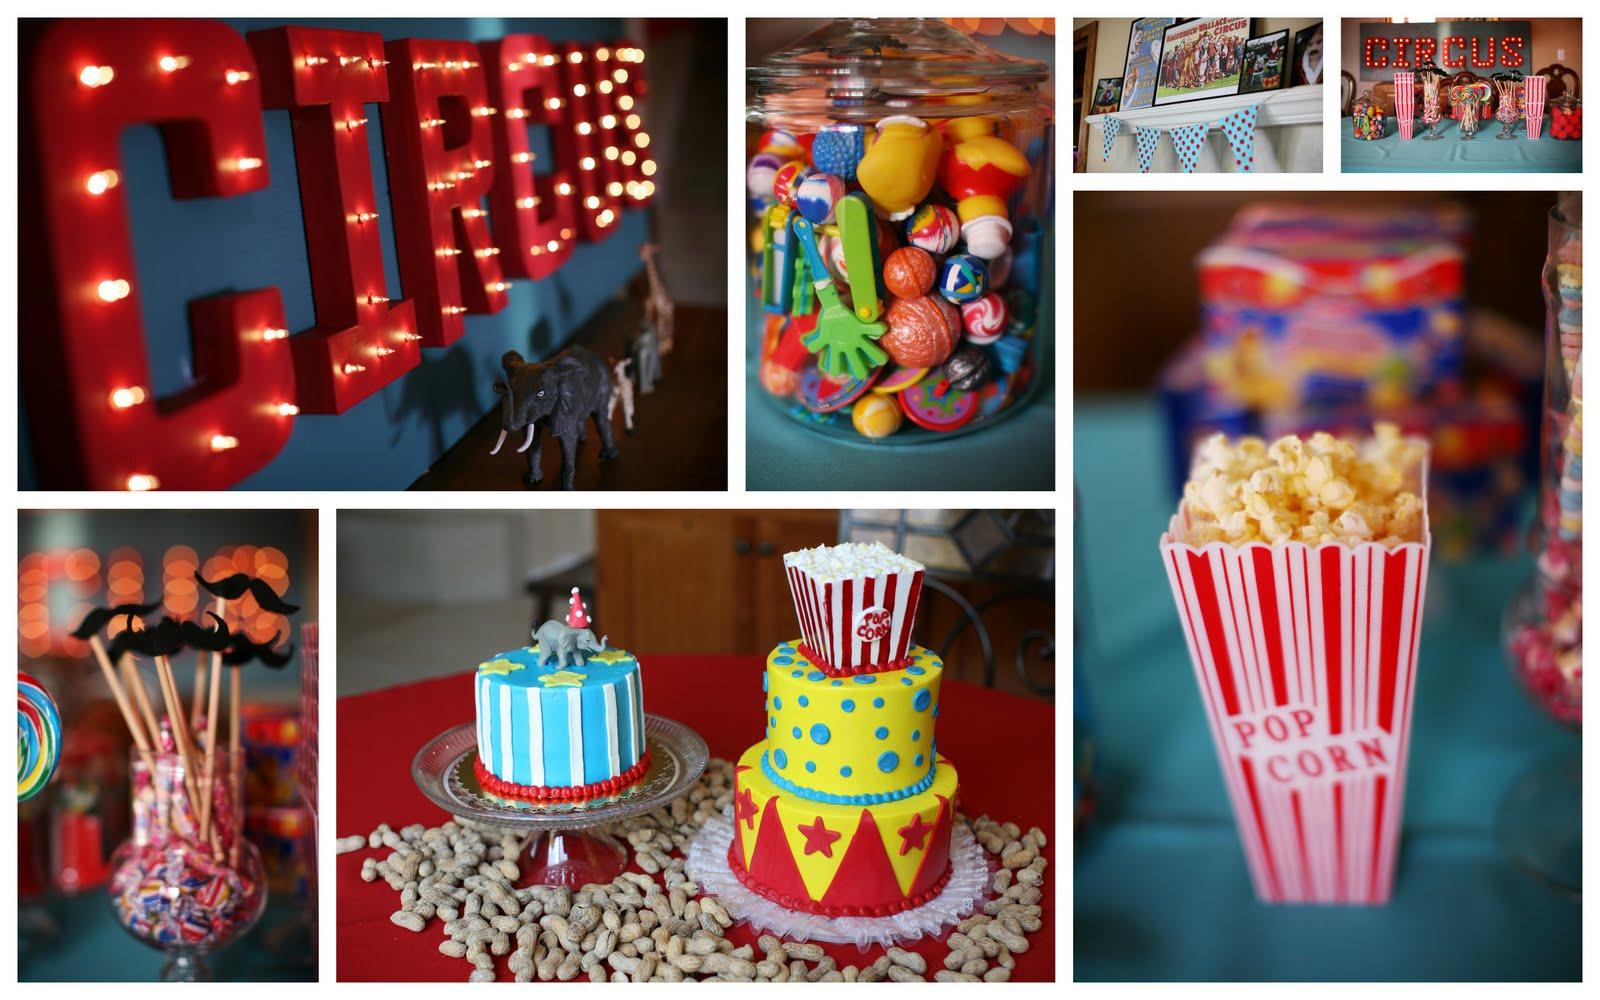 graydon decorations on ideas carnival decor by cake novelty parties sugar cakes party birthday dallas koch pin pinterest davis themed circus